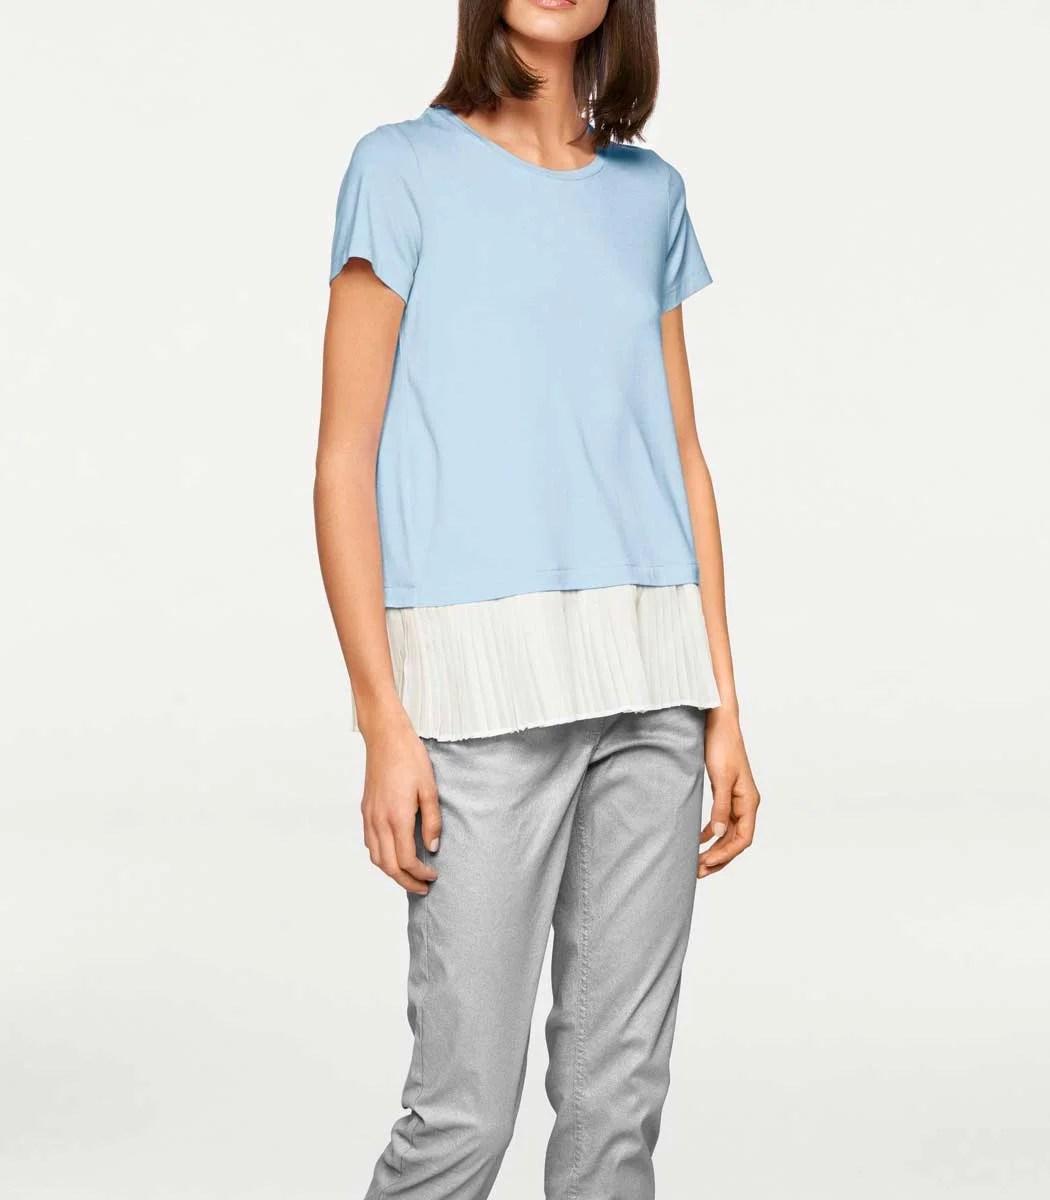 006.790 RICK CARDONA Damen Designer-2-in-1-Shirt Hellblau-Weiß